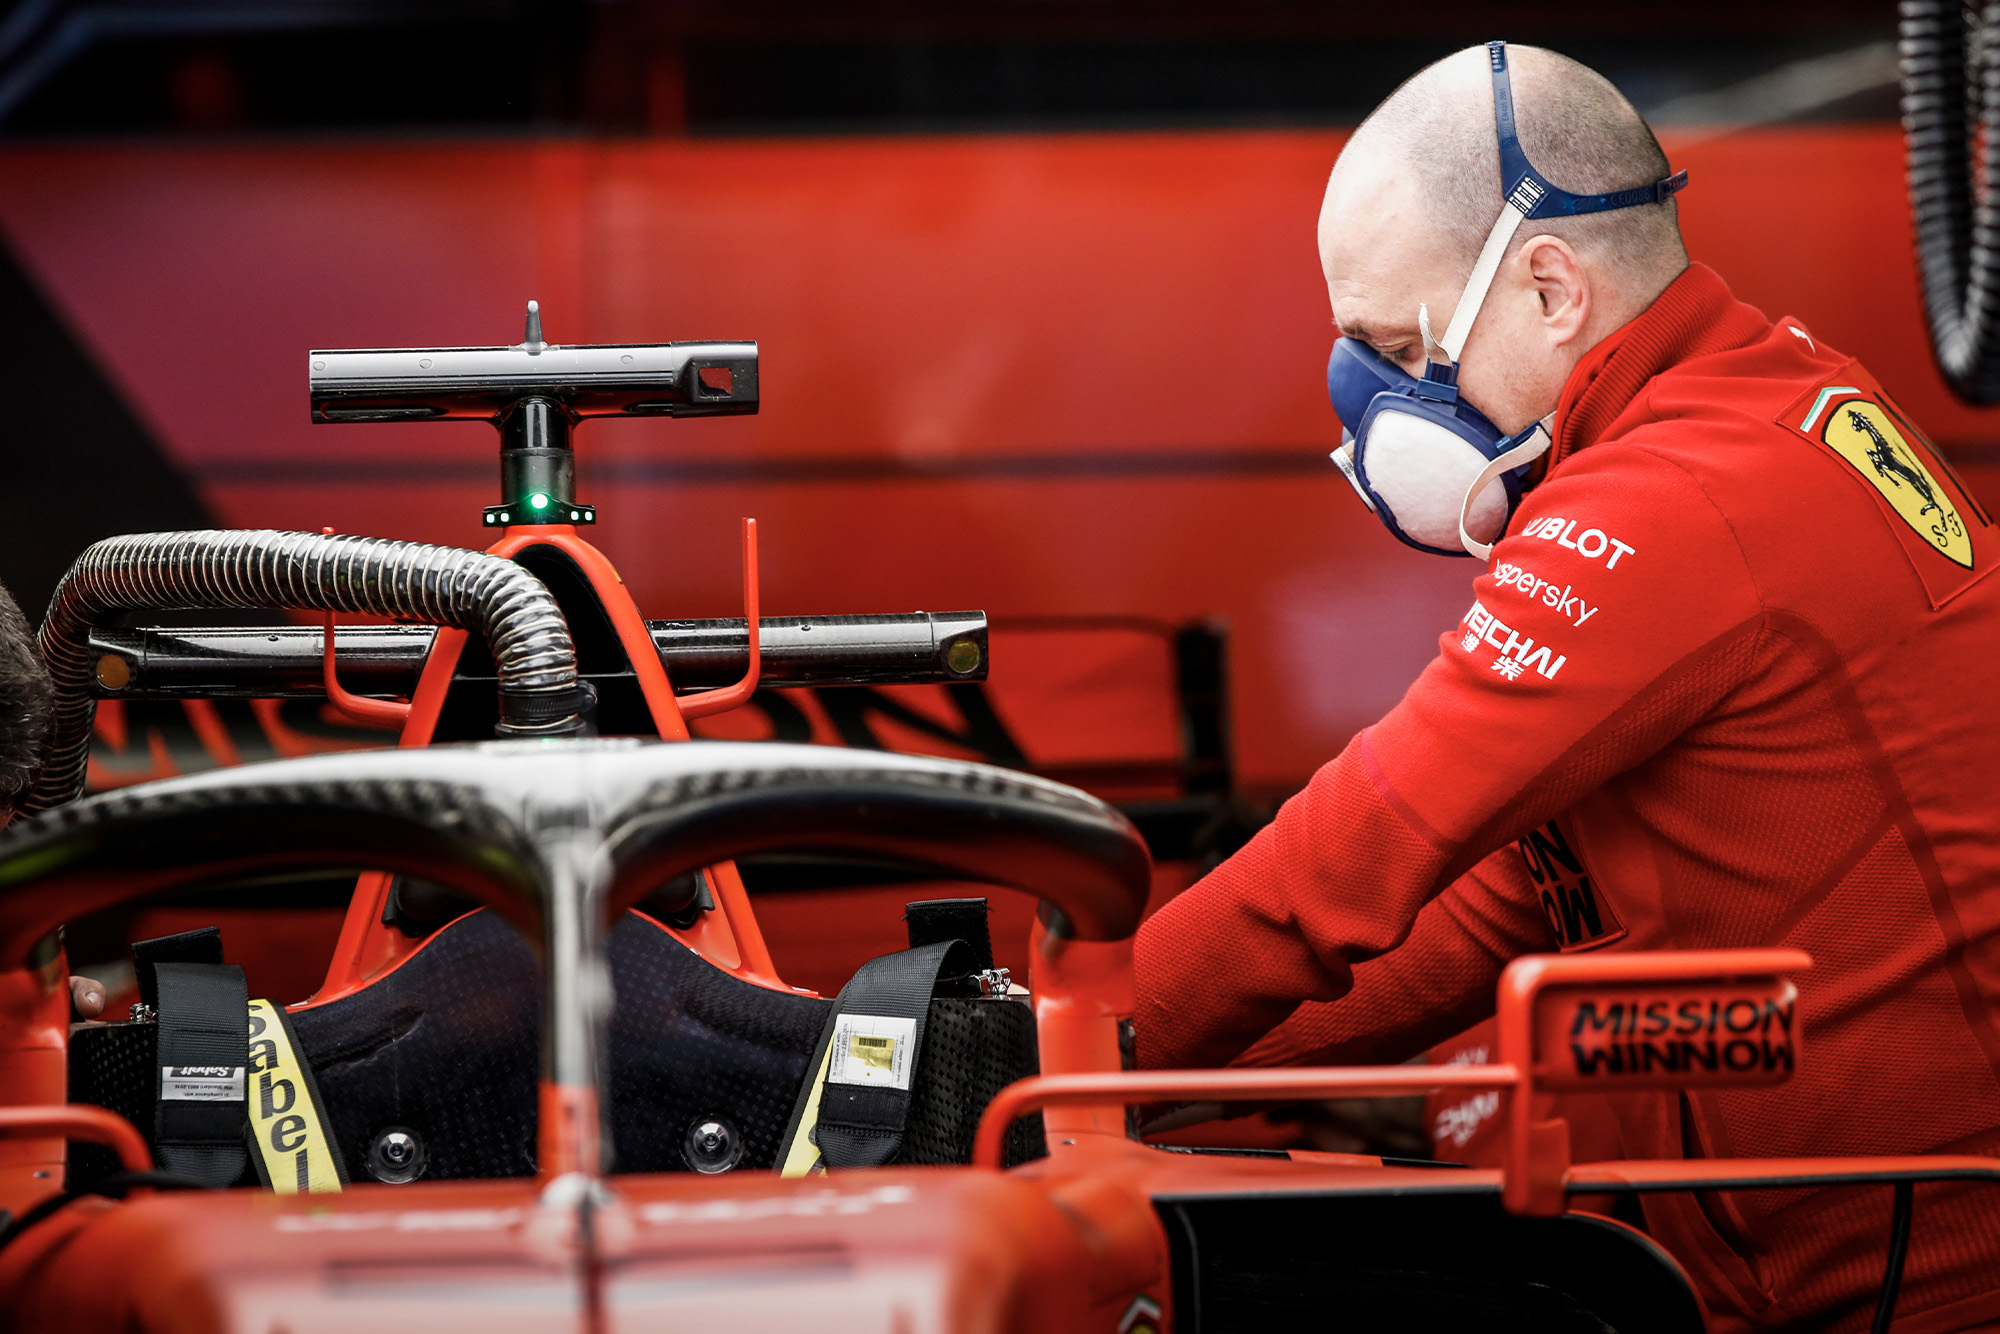 Timeline: Ferrari's power unit problems and FIA investigation